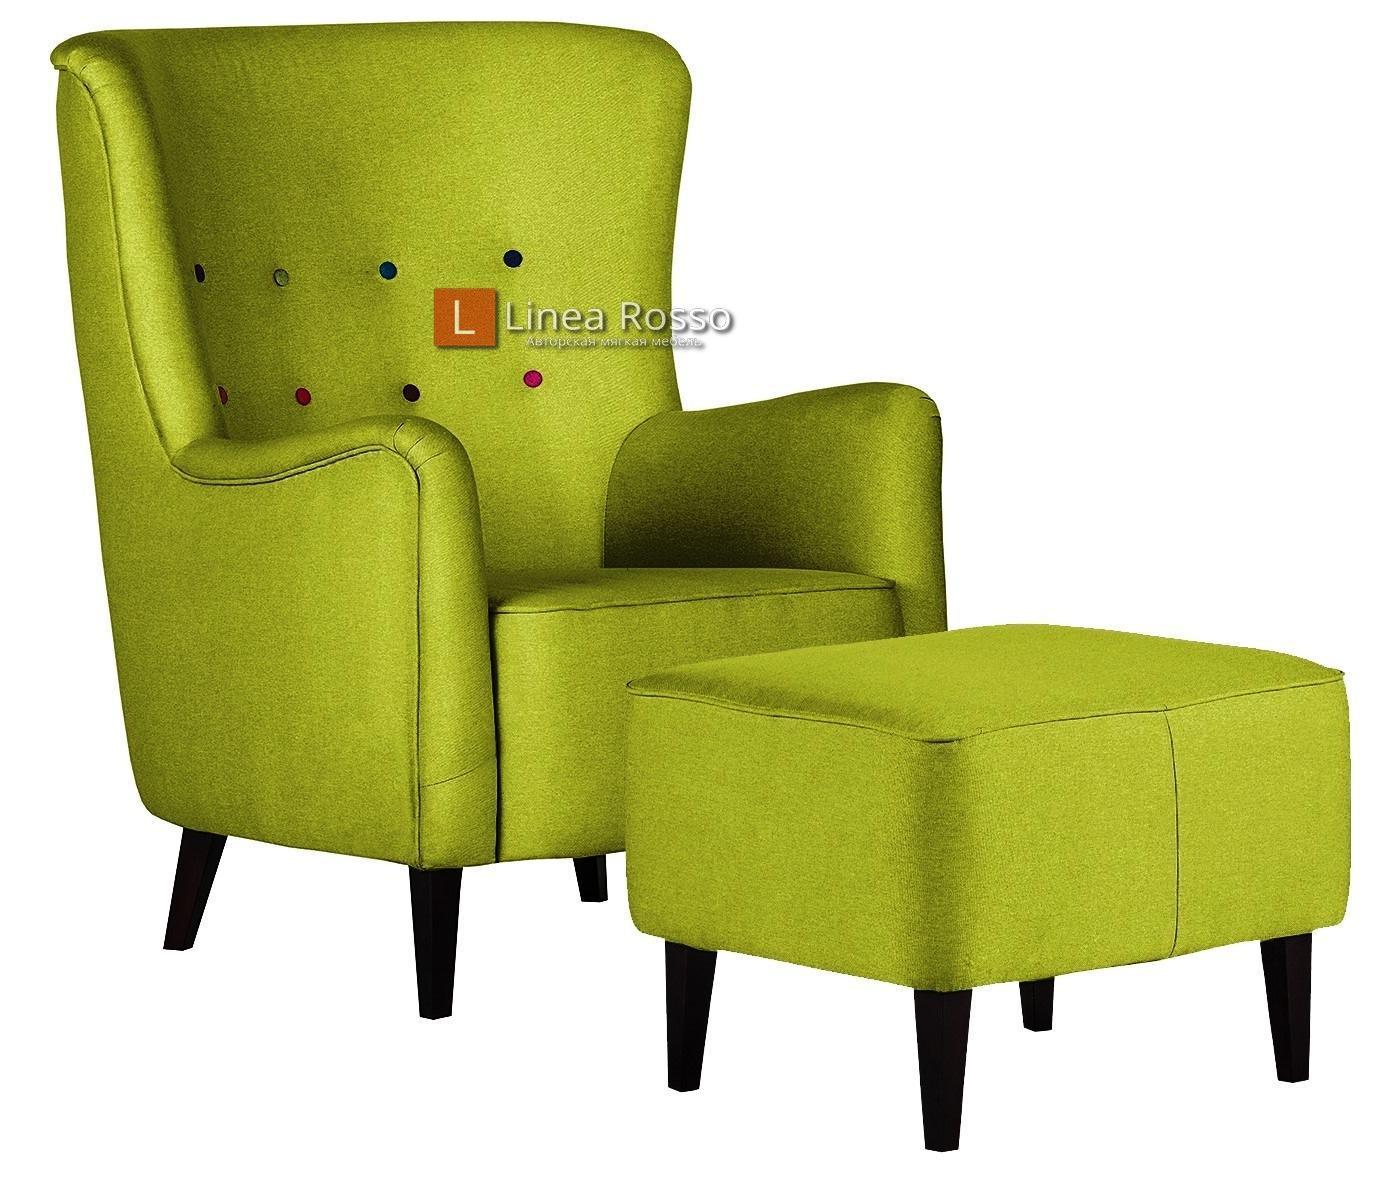 salatovoe kreslo - Кресло в салатовом цвете на заказ